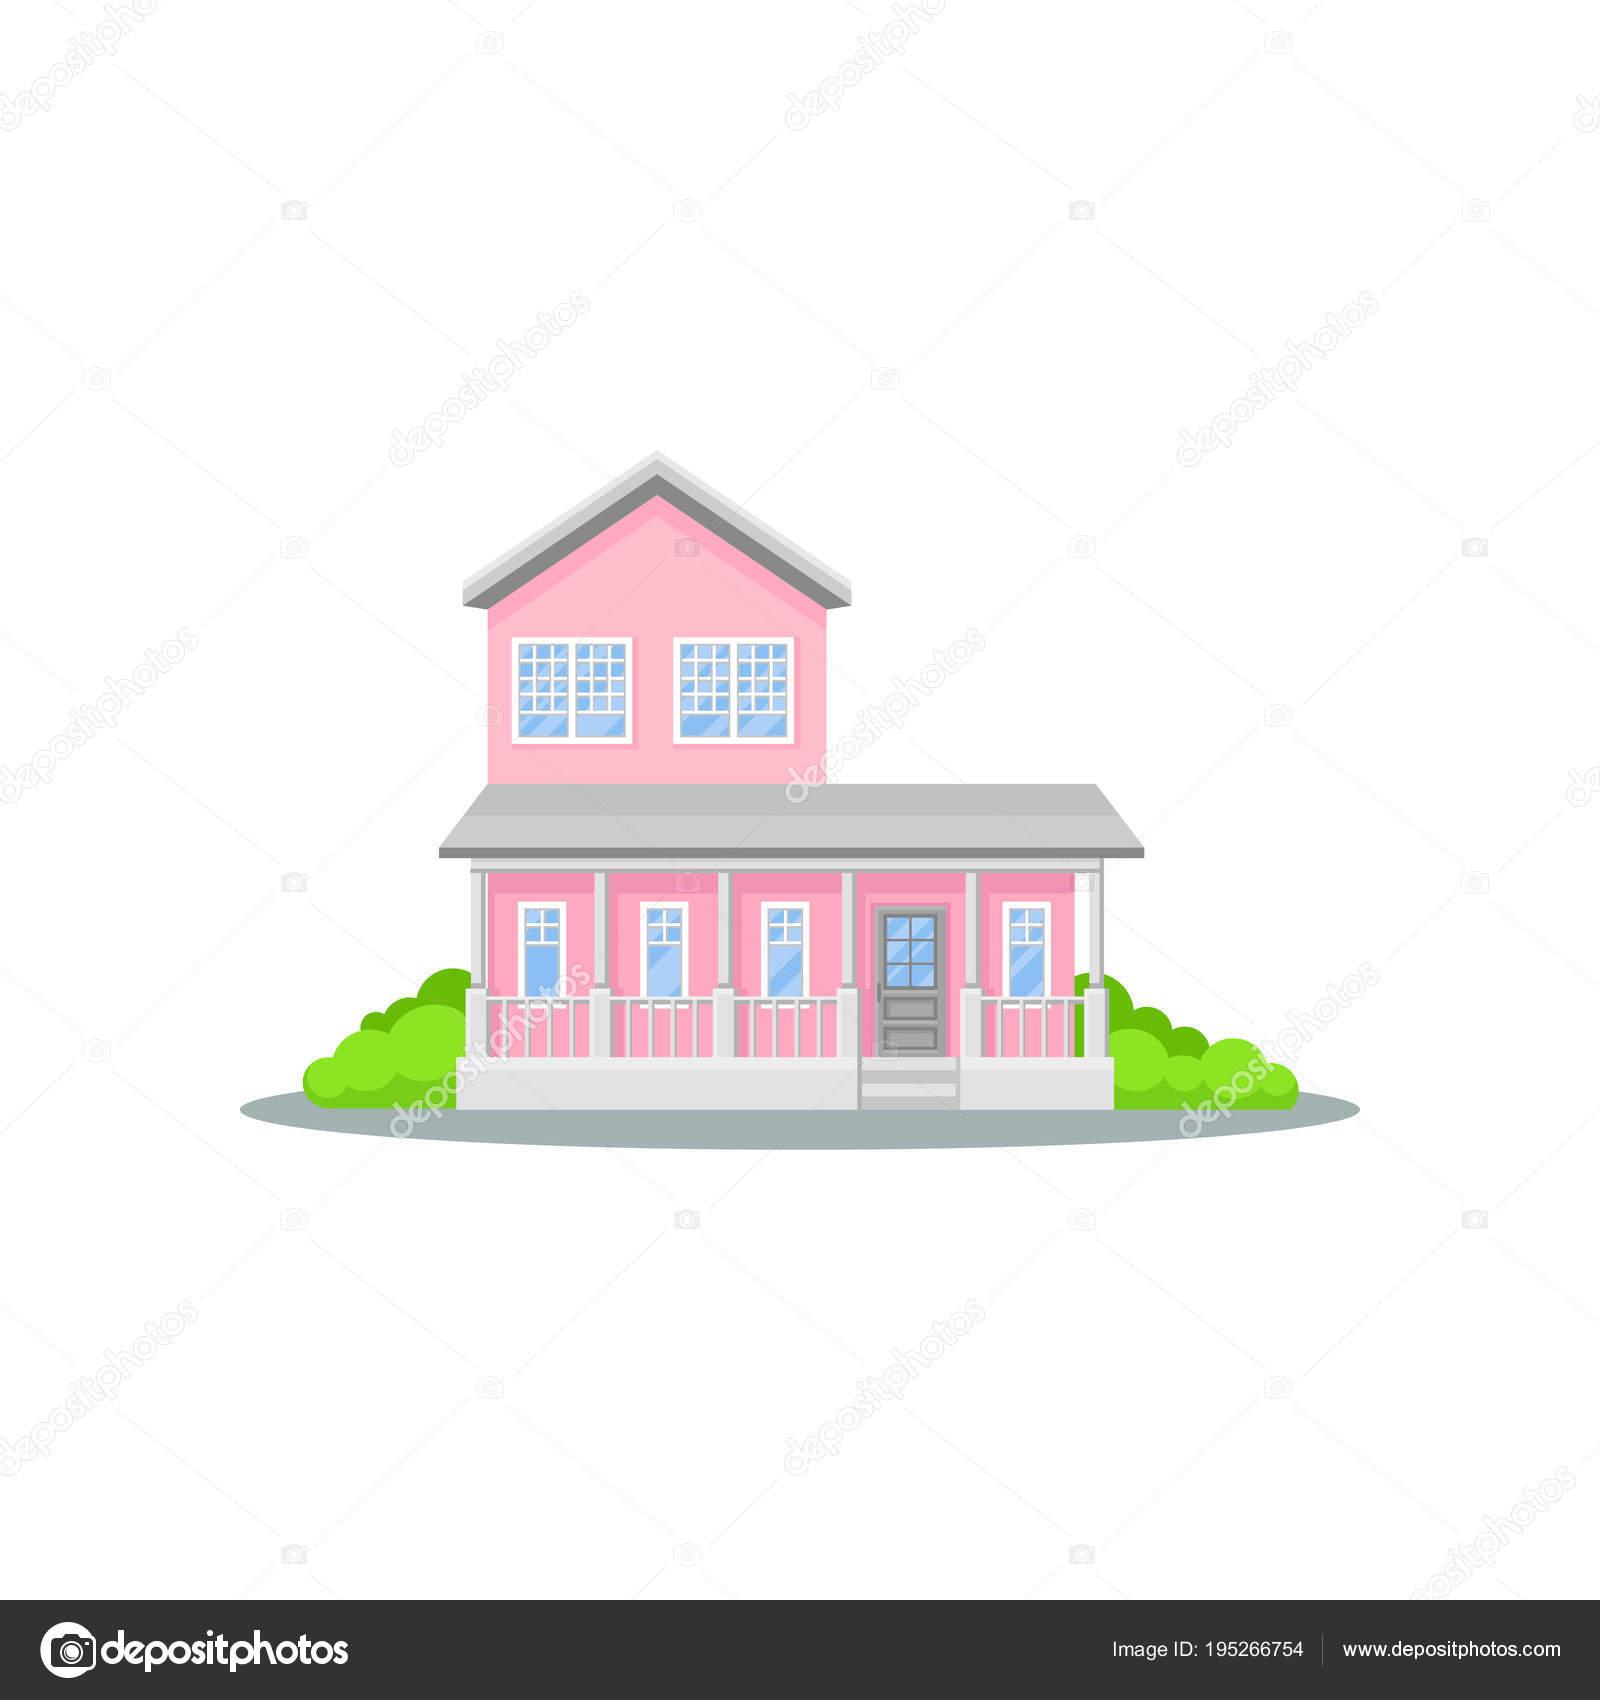 Dibujos La Casa Rosada Encantadora Casa Rosada De Dos